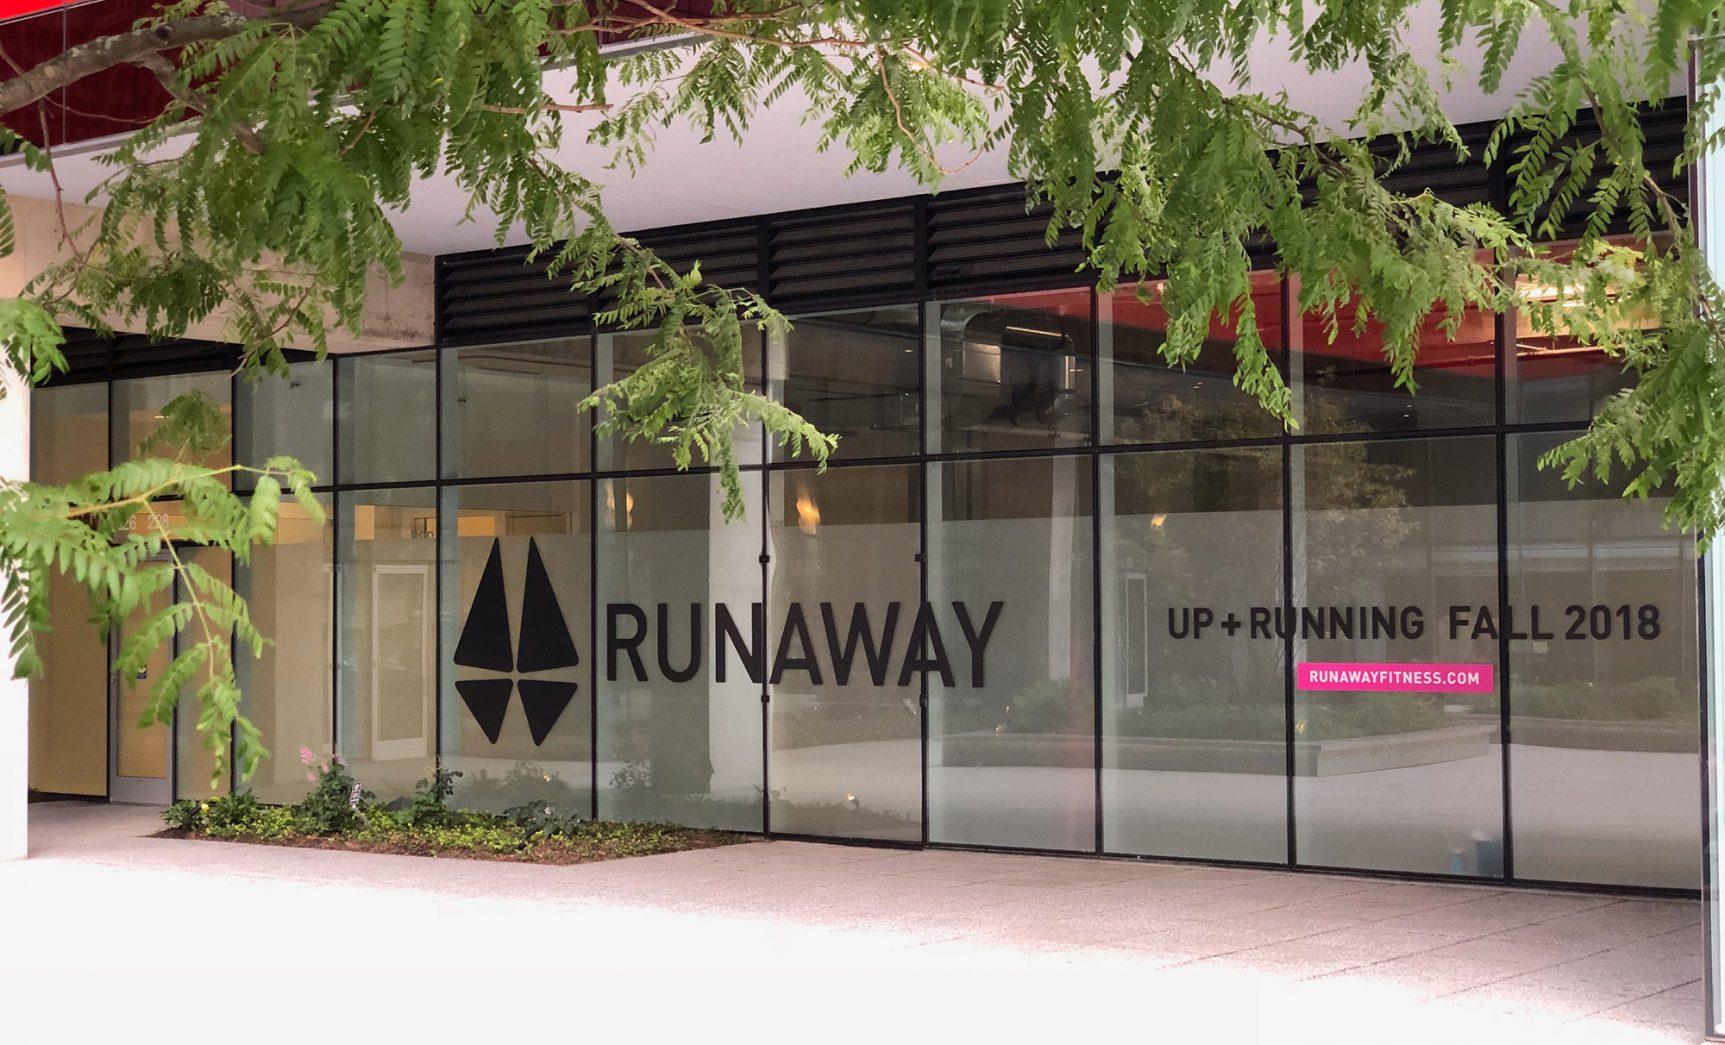 runaway fitness